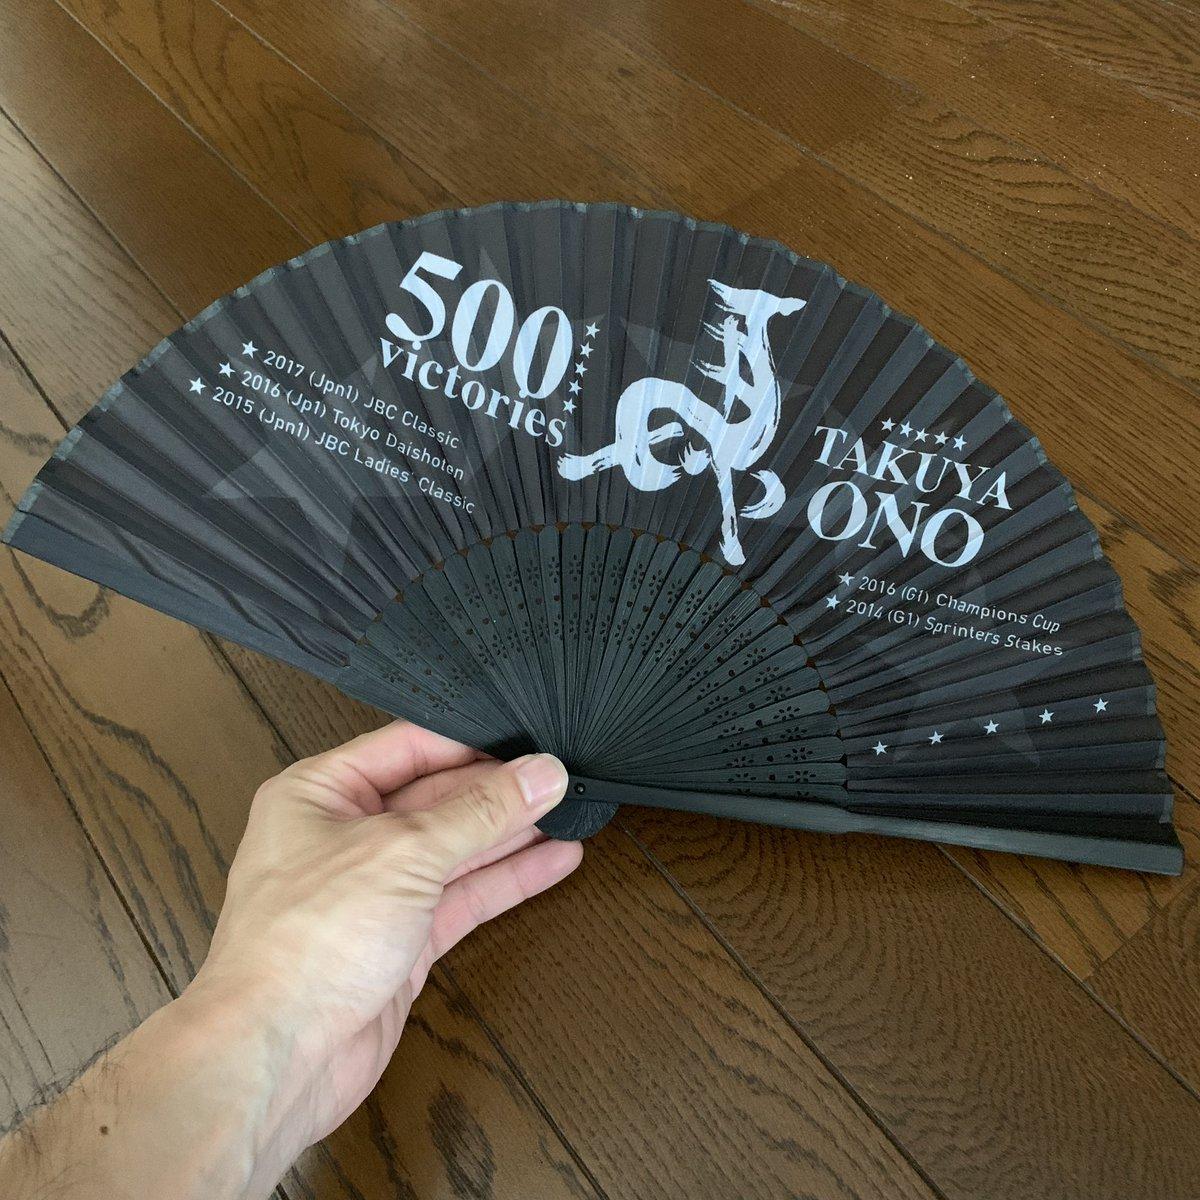 JRA大野拓弥騎手のお父様より、素敵なプレゼントを頂きました! 大切に使わせて頂きます。 #大野拓弥騎手 #500勝記念